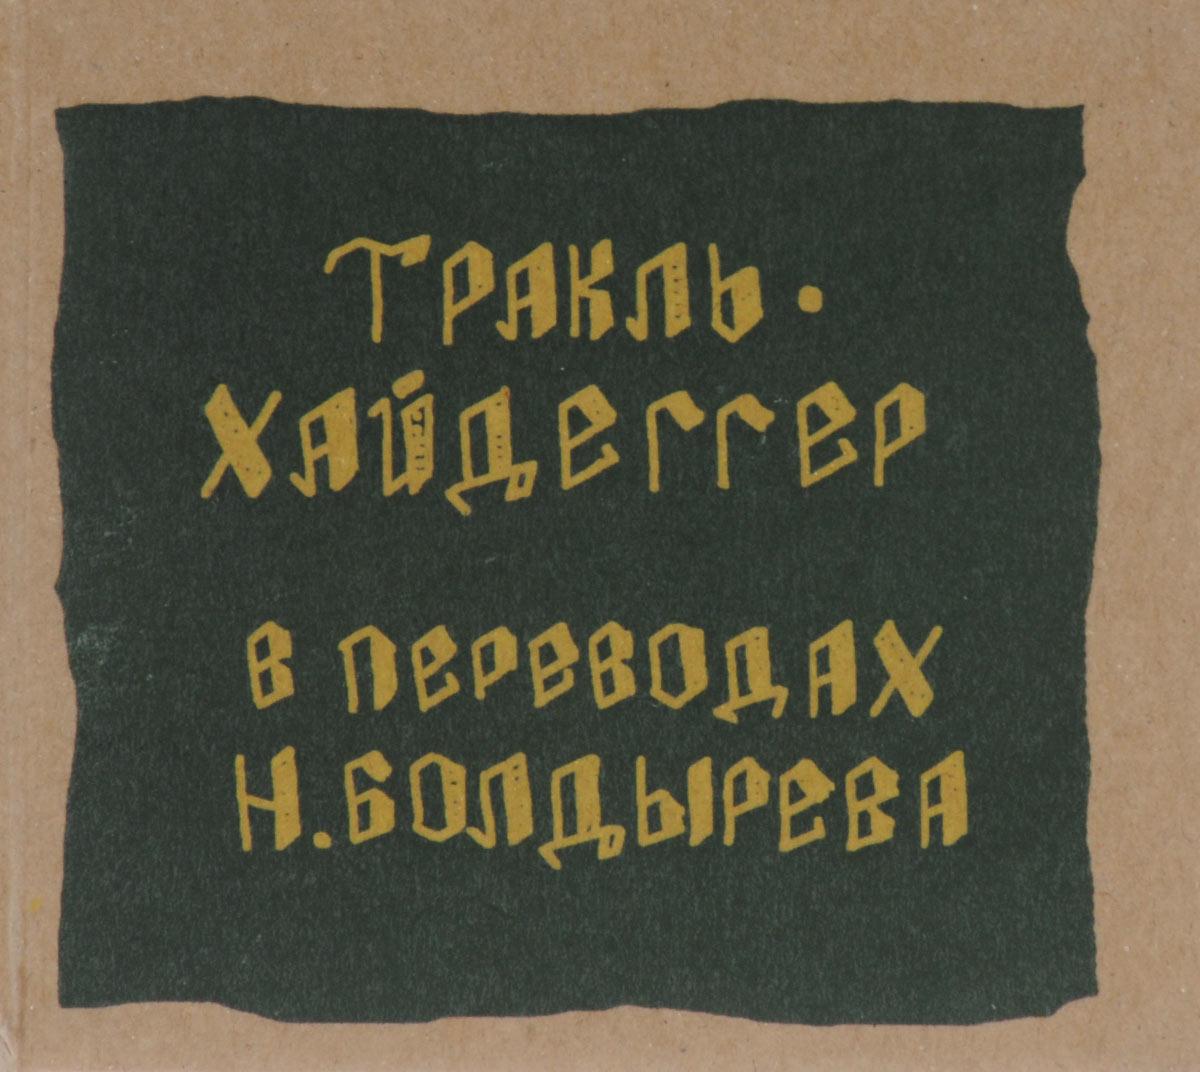 Георг Тракль,Мартин Хайдеггер Георг Тракль. Песнь Отрешенного. Мартин Хайдеггер. Язык поэмы мартин хайдеггер гегель